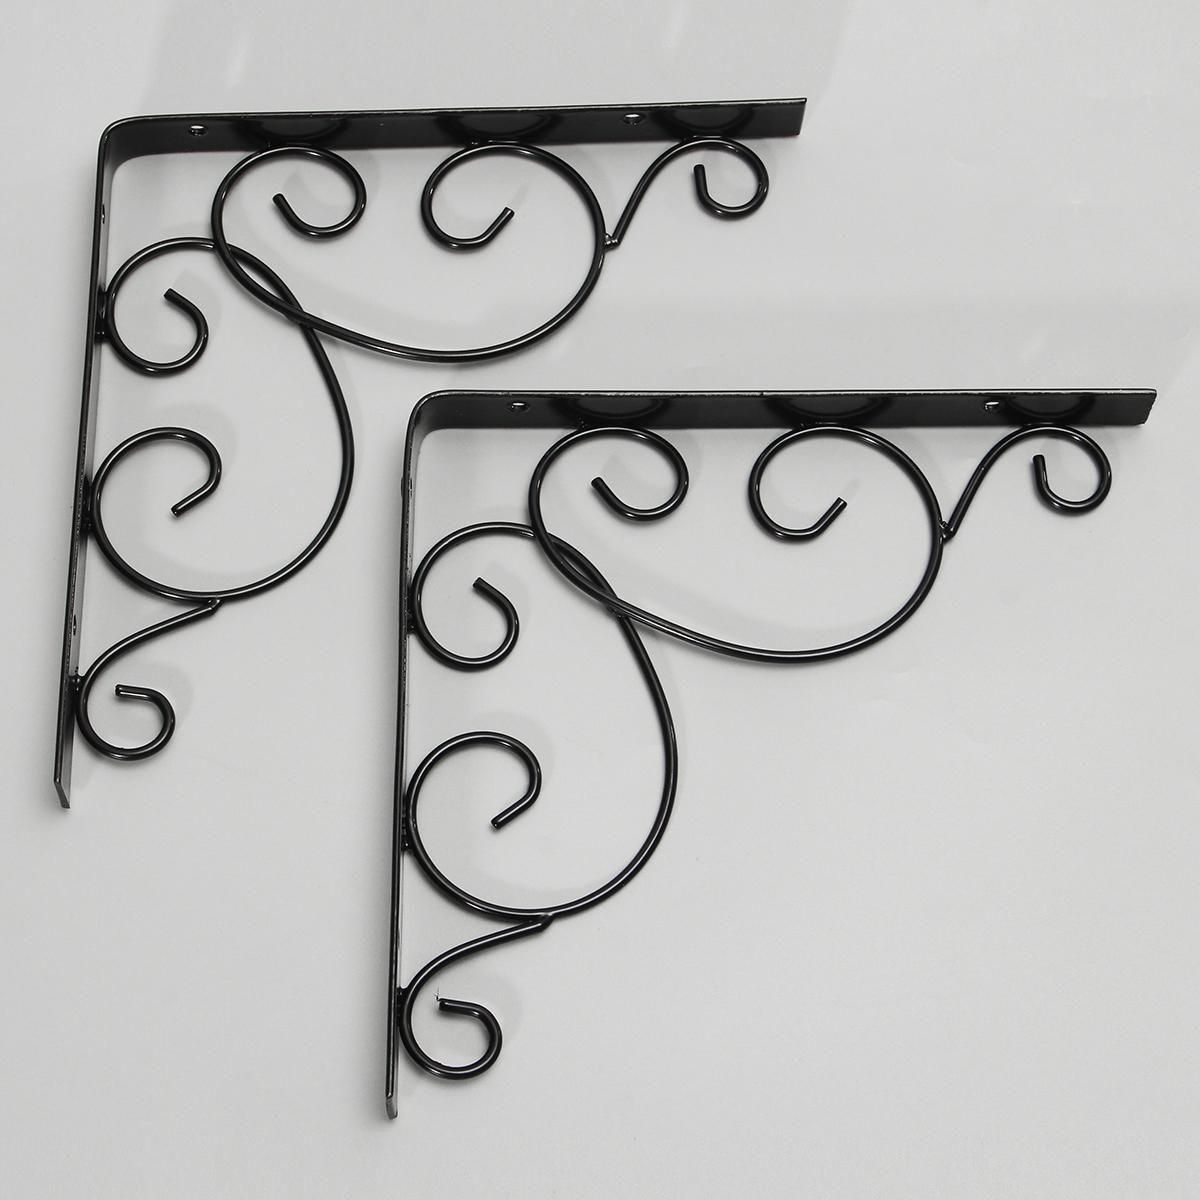 1 Pair Antique Floral Cast Iron Shelf Brackets Support Wall